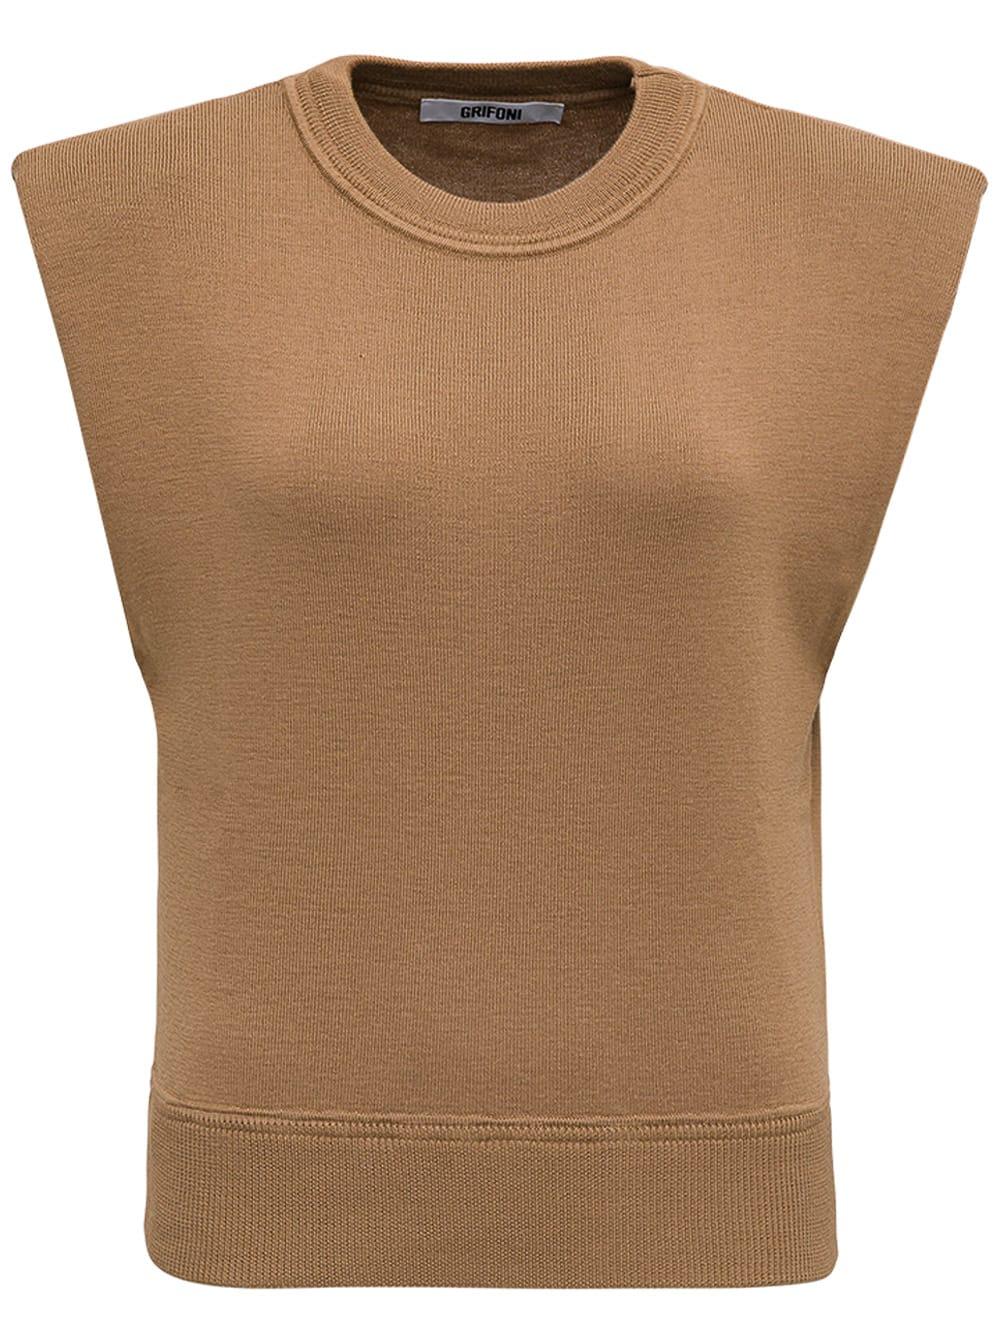 Brown Wool Vest With Padded Shoulder Straps